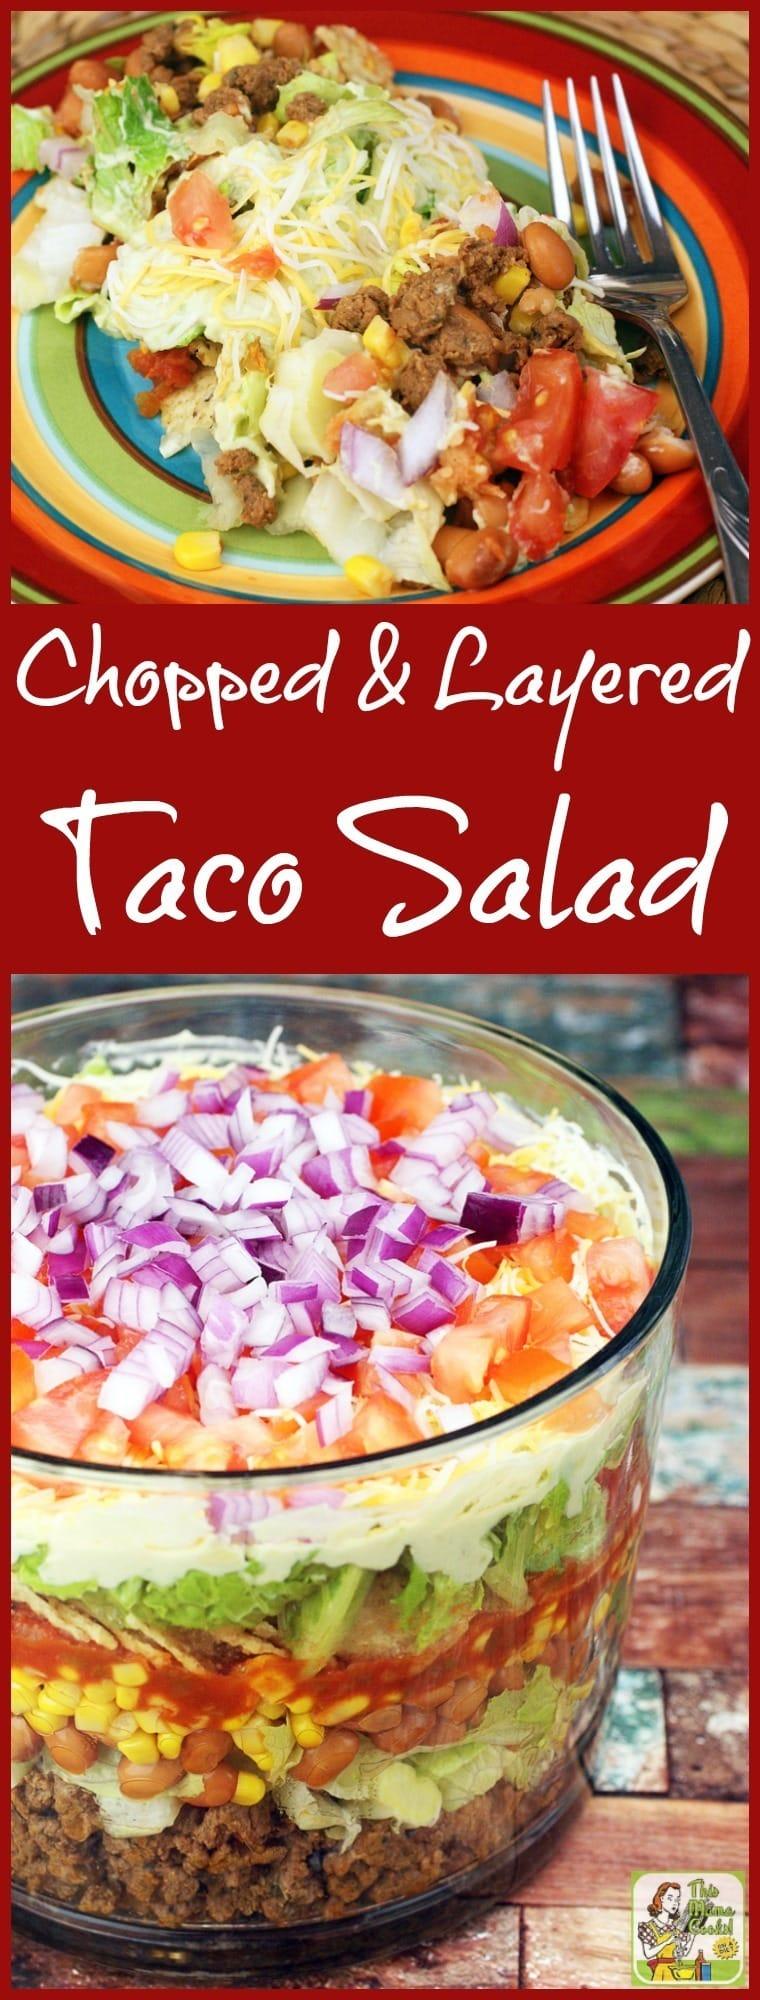 Chopped & Layered Taco Salad Recipe